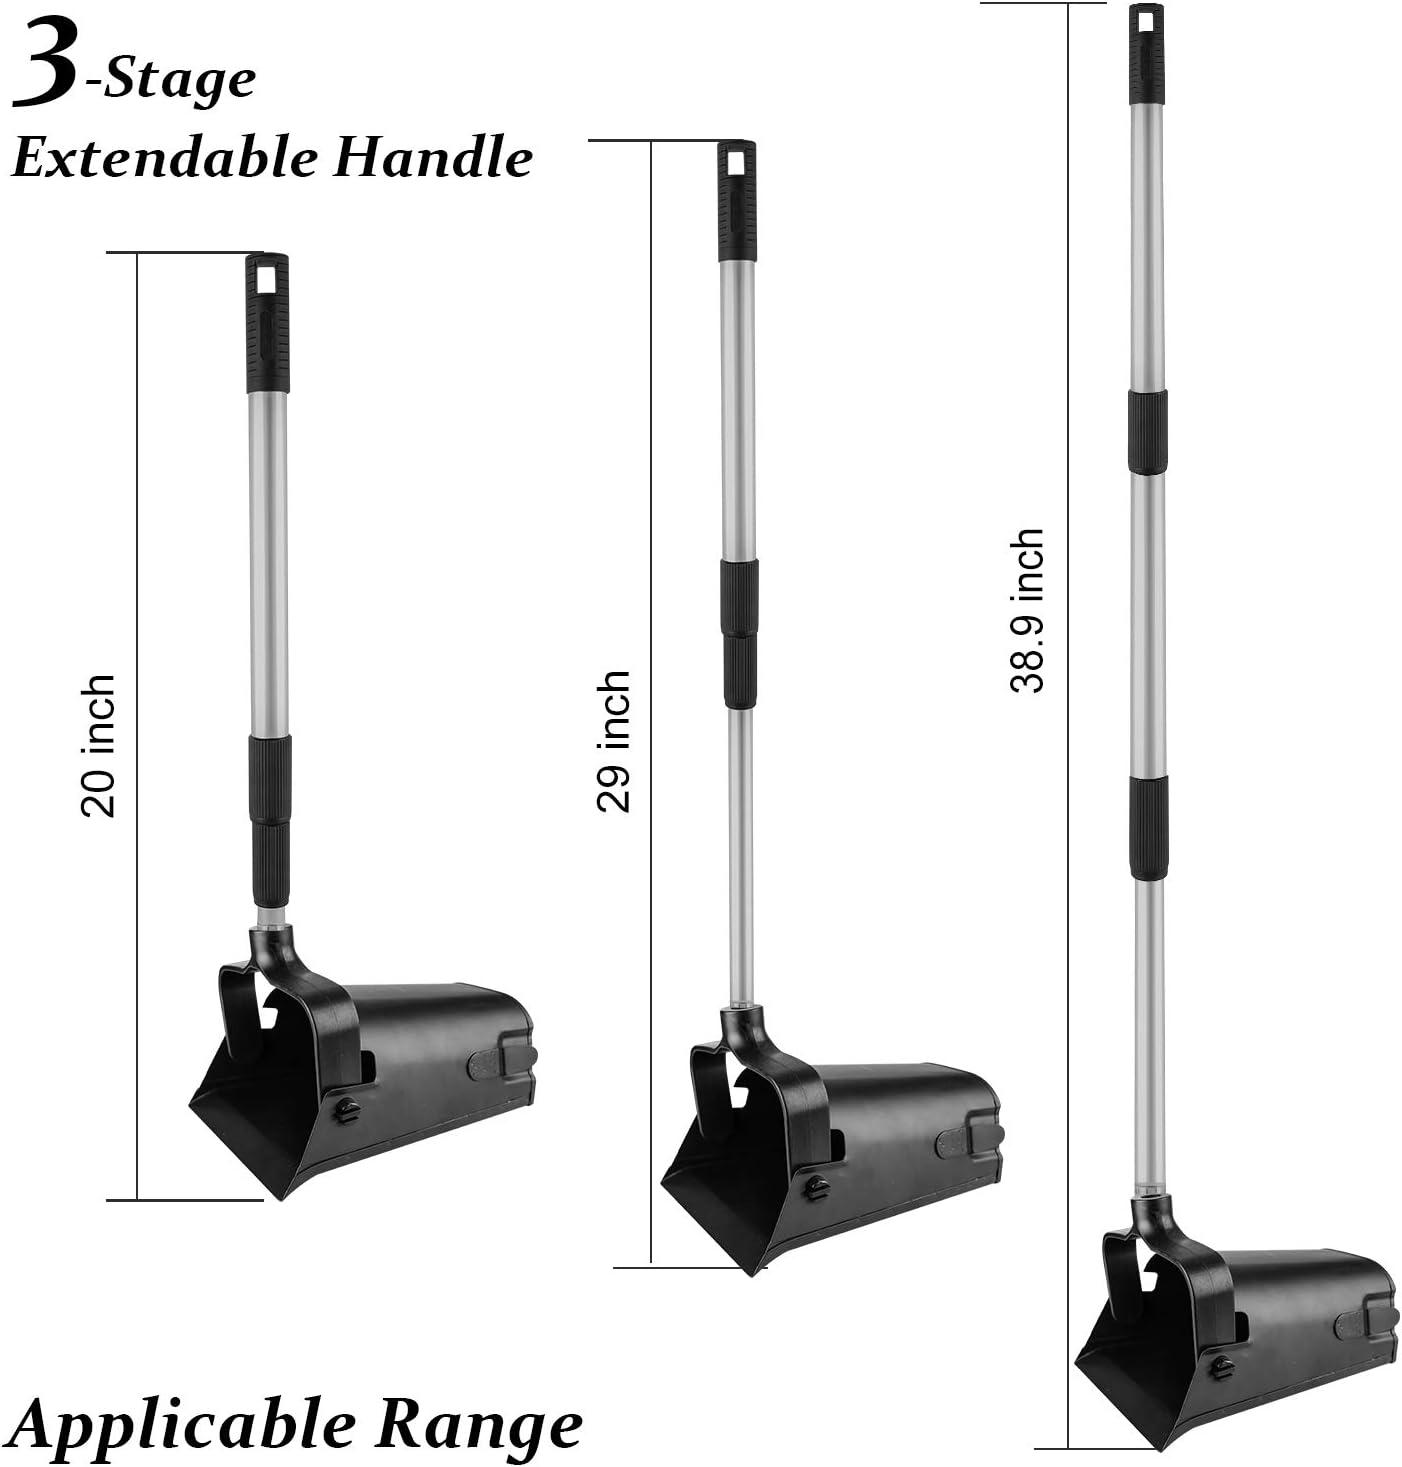 SKYFIELD Swivel Bin /& Rake Pooper Scooper Kit Extendable Aluminum Handle Poop Scooper Rake with Heavy Duty Metal Bin Compact Storage String Pouch Included